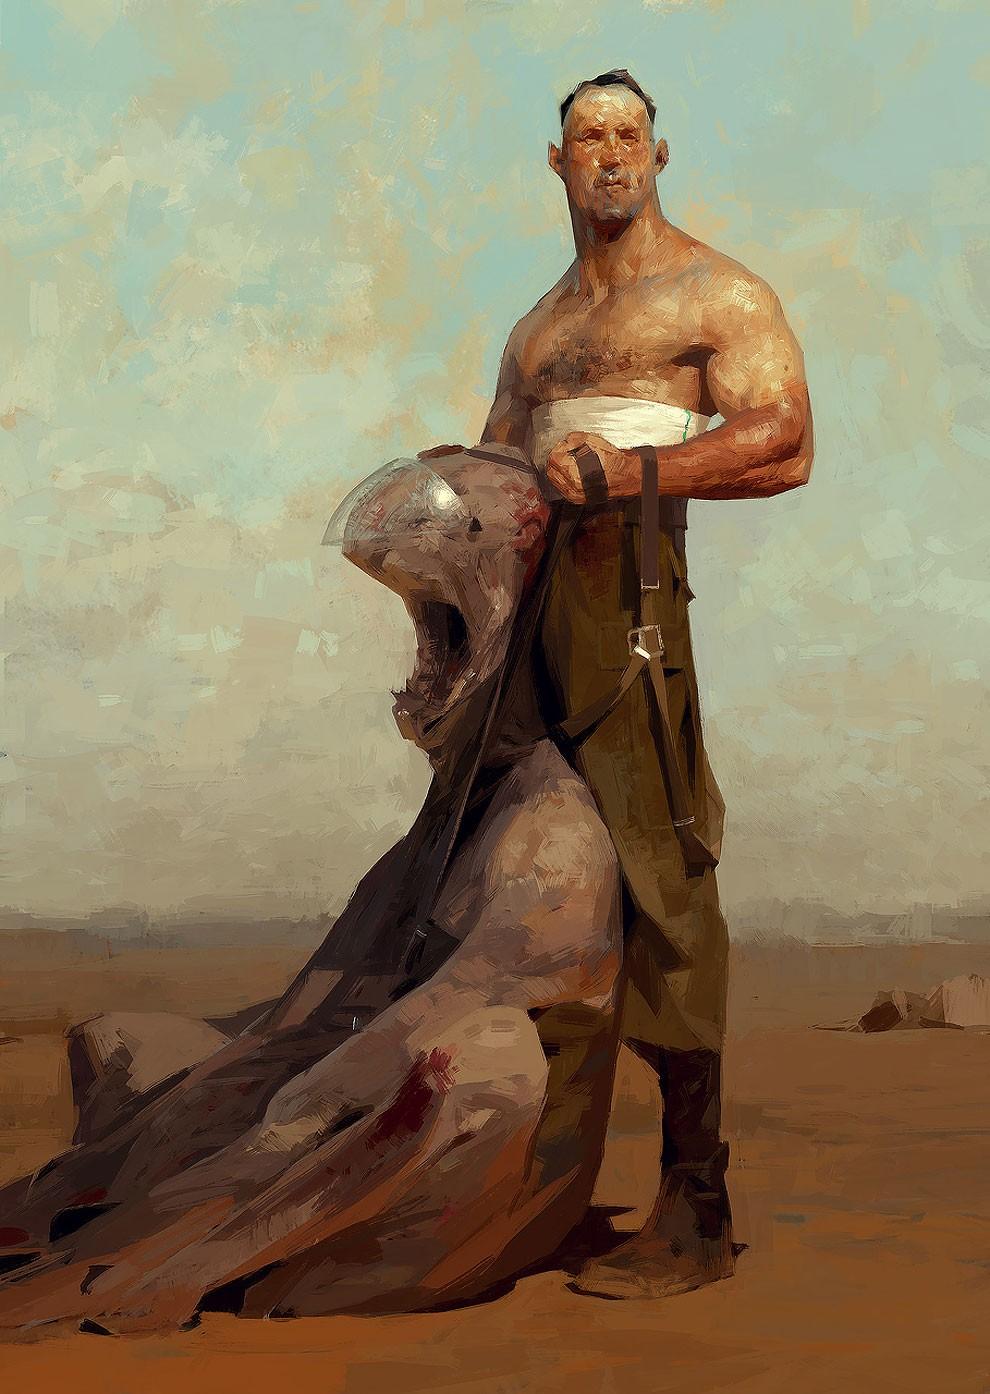 dipinti-digitali-horror-fantasy-sergey-kolesov-peleng-15